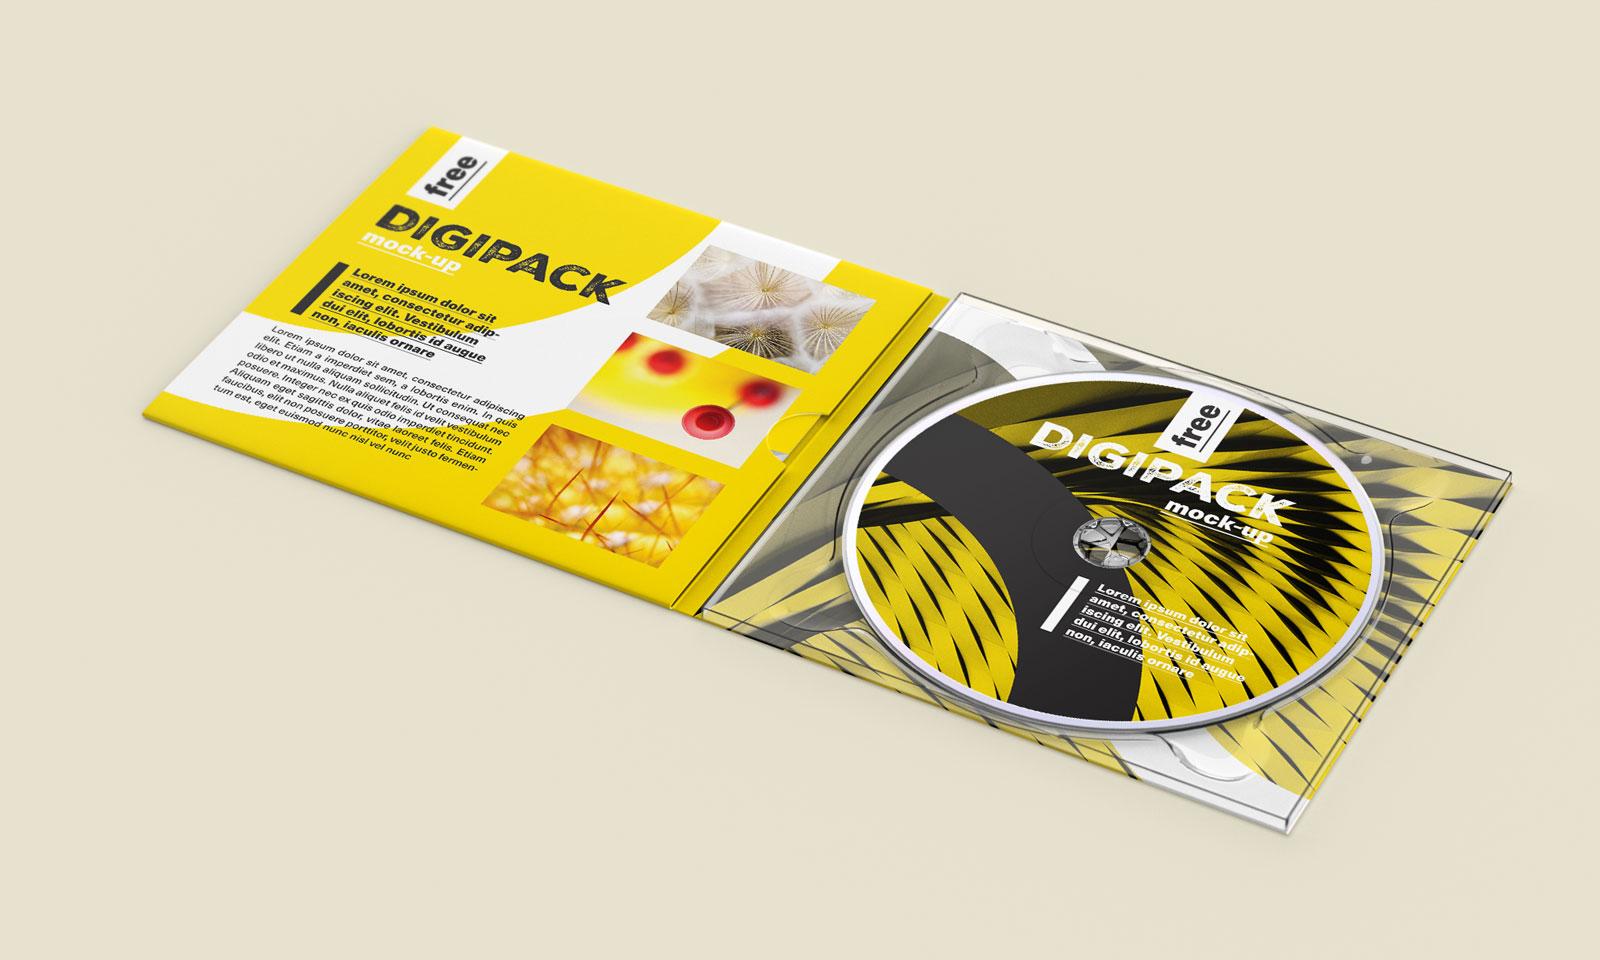 Free-CD-Disc-DVD-Case-Digipack-Mockup-PSD-4